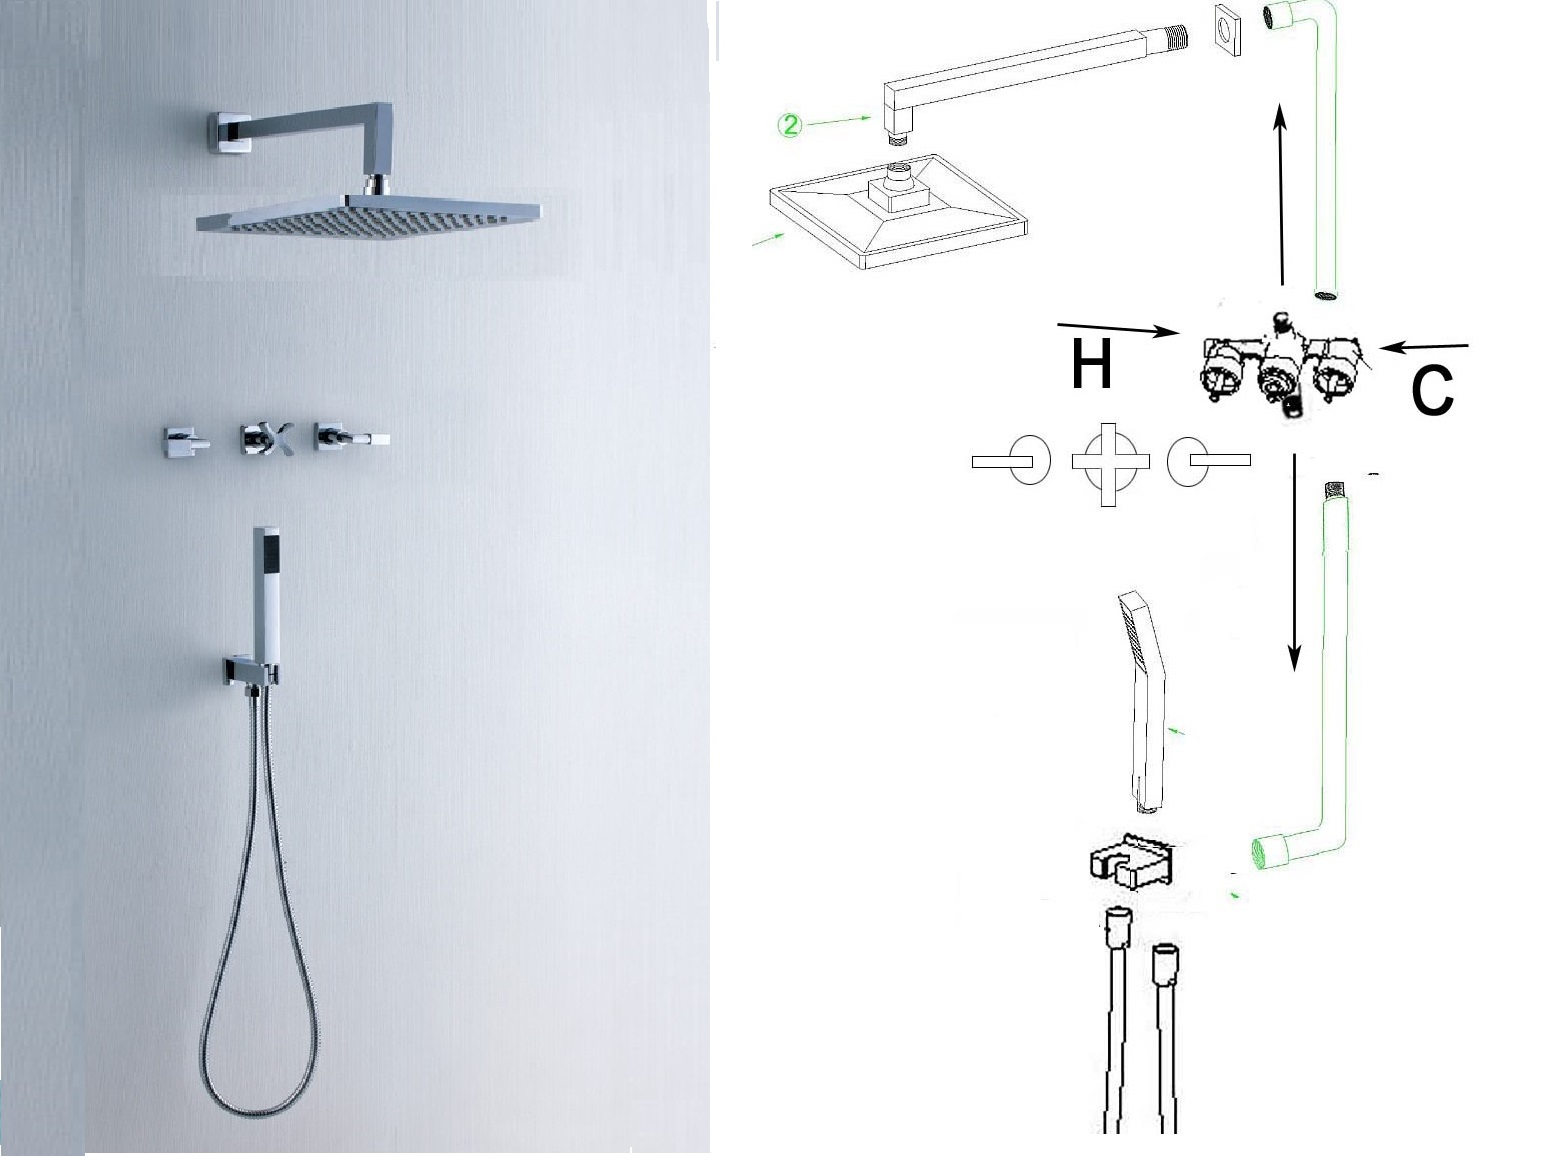 Grohe Shower Valve Installation Instructions